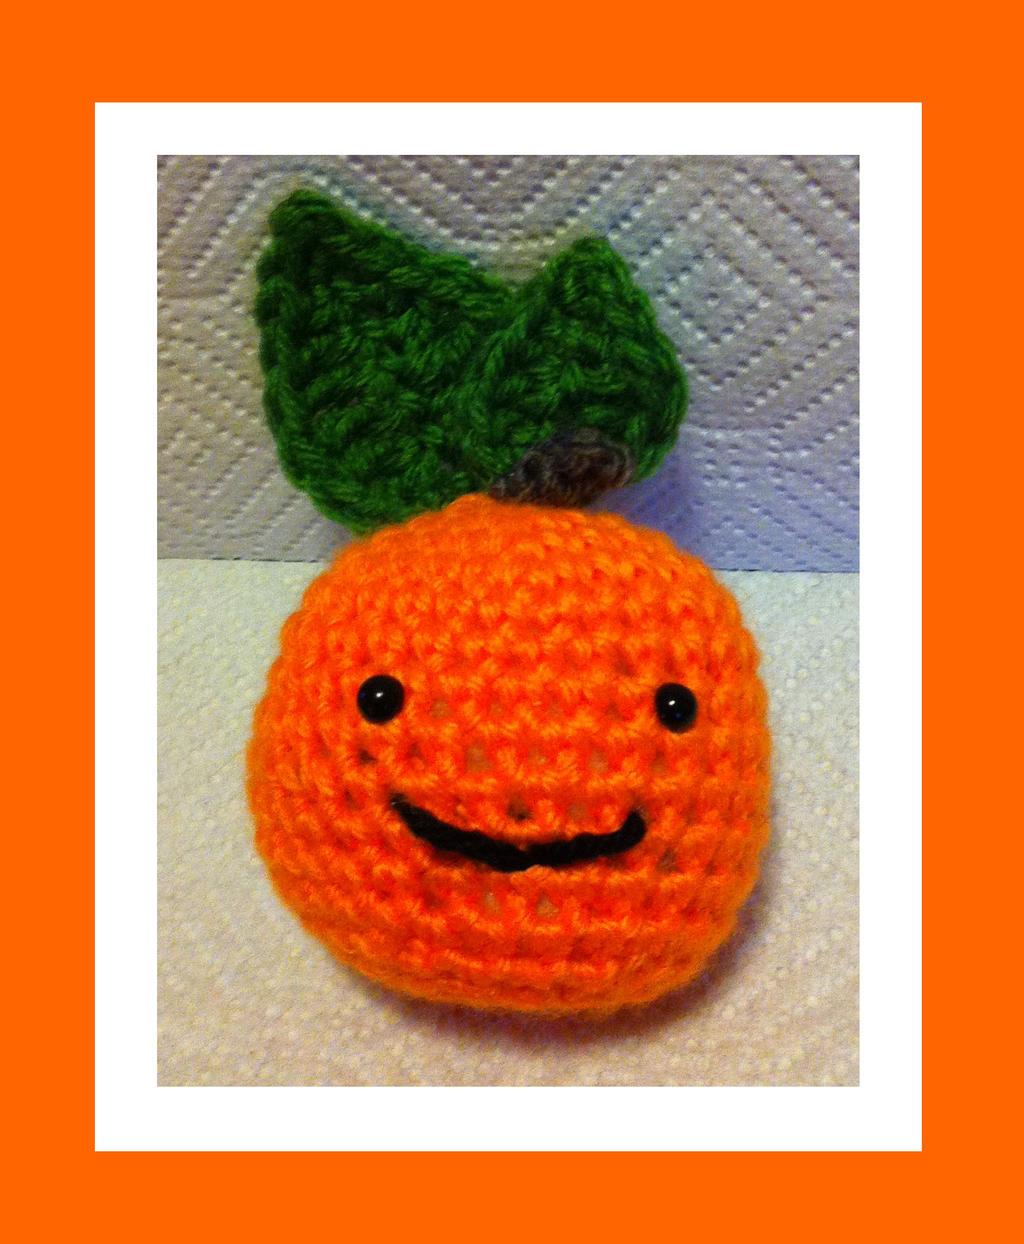 Peelable Orange Amigurumi : Orange Amigurumi by DarkWater9 on DeviantArt